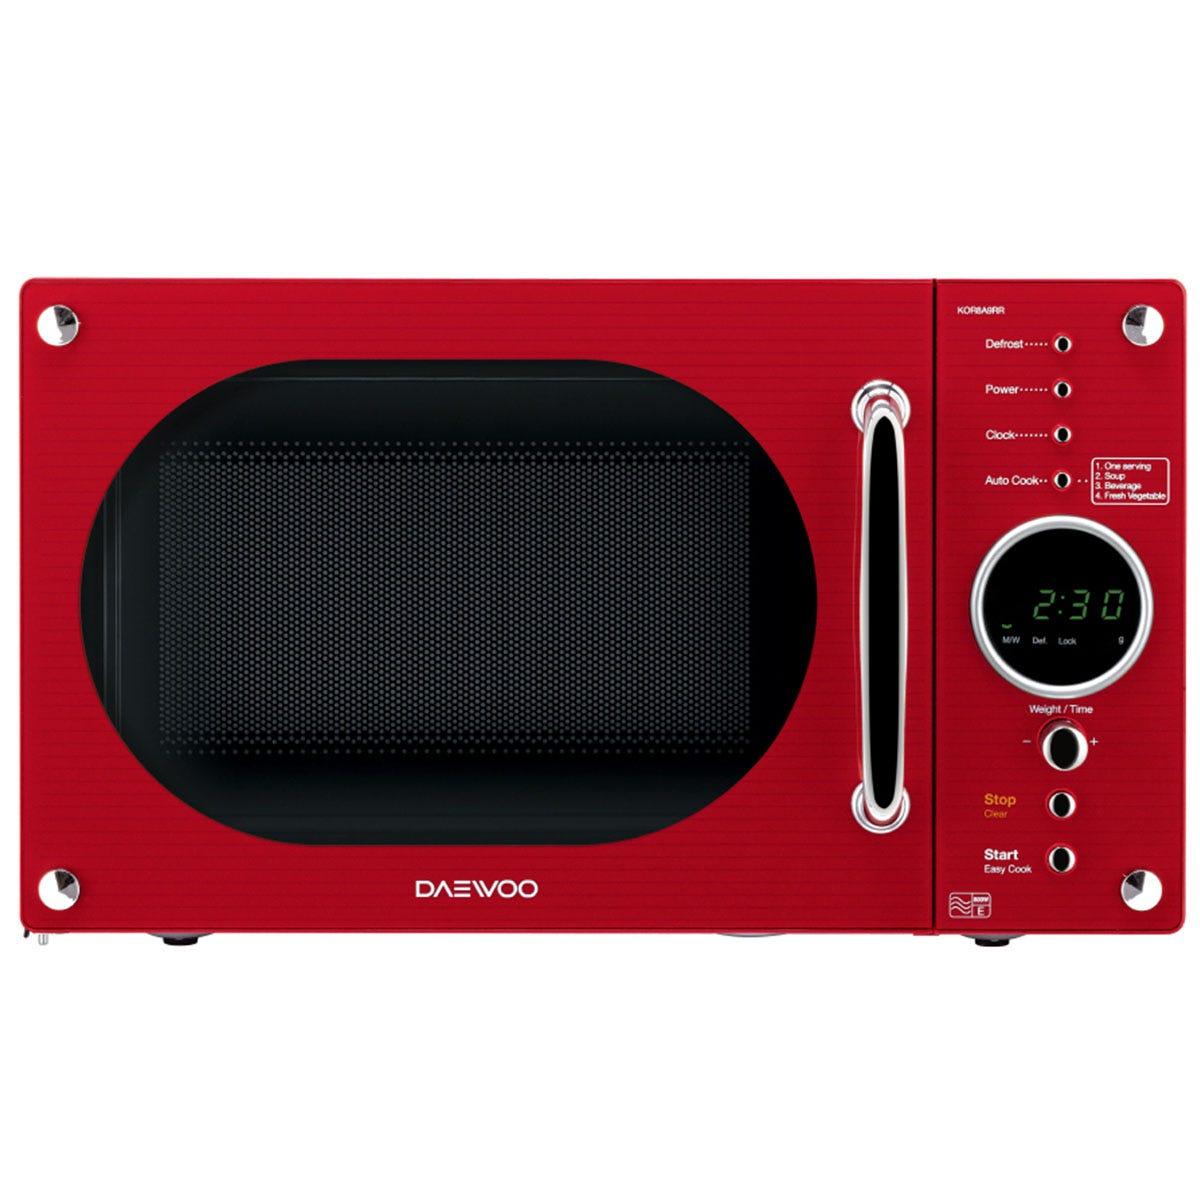 Daewoo KOR8A9RDR 23L Retro Design 800W Manual Microwave - Red